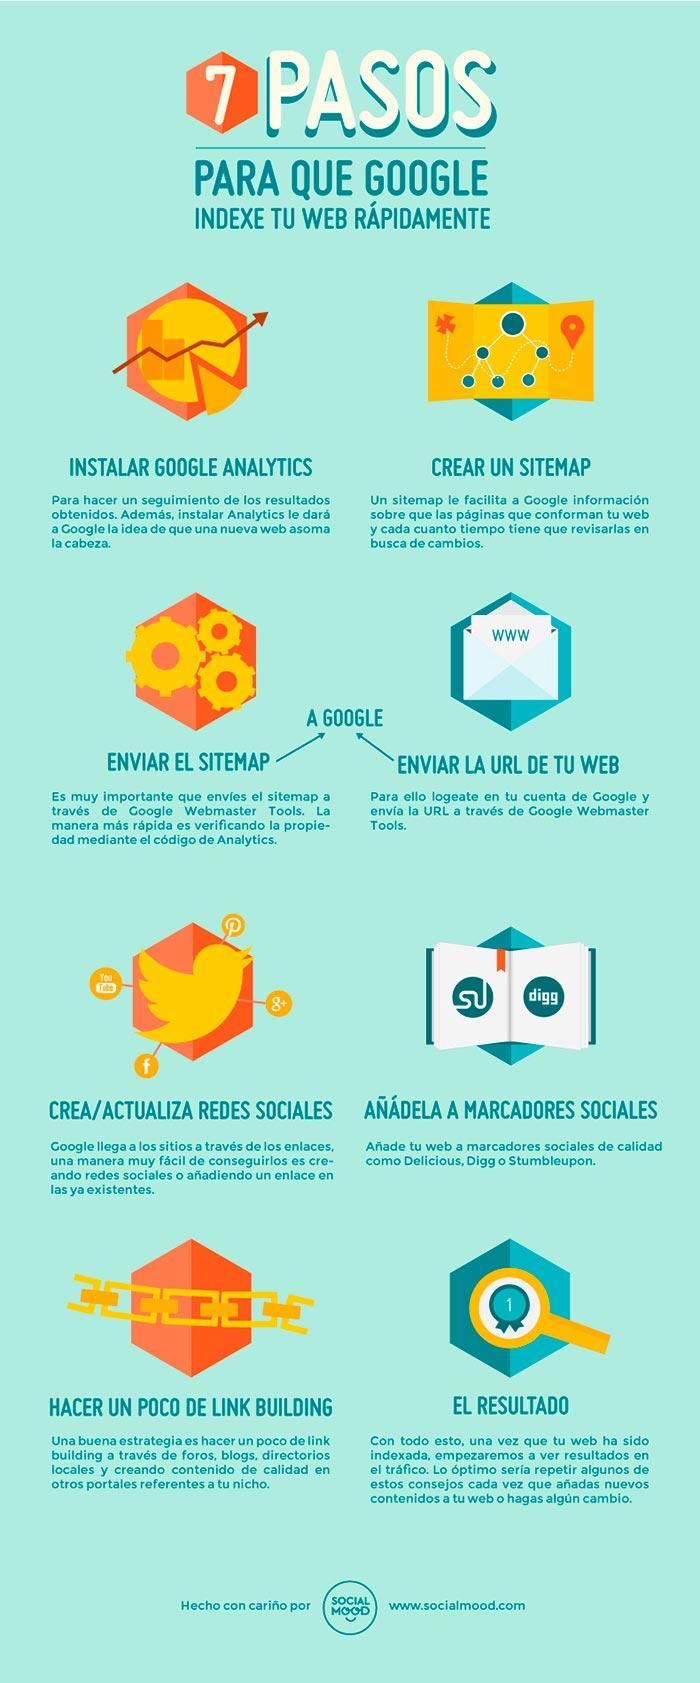 Infografia sobre los 7 pasos para que google indexe tu web rapidamente